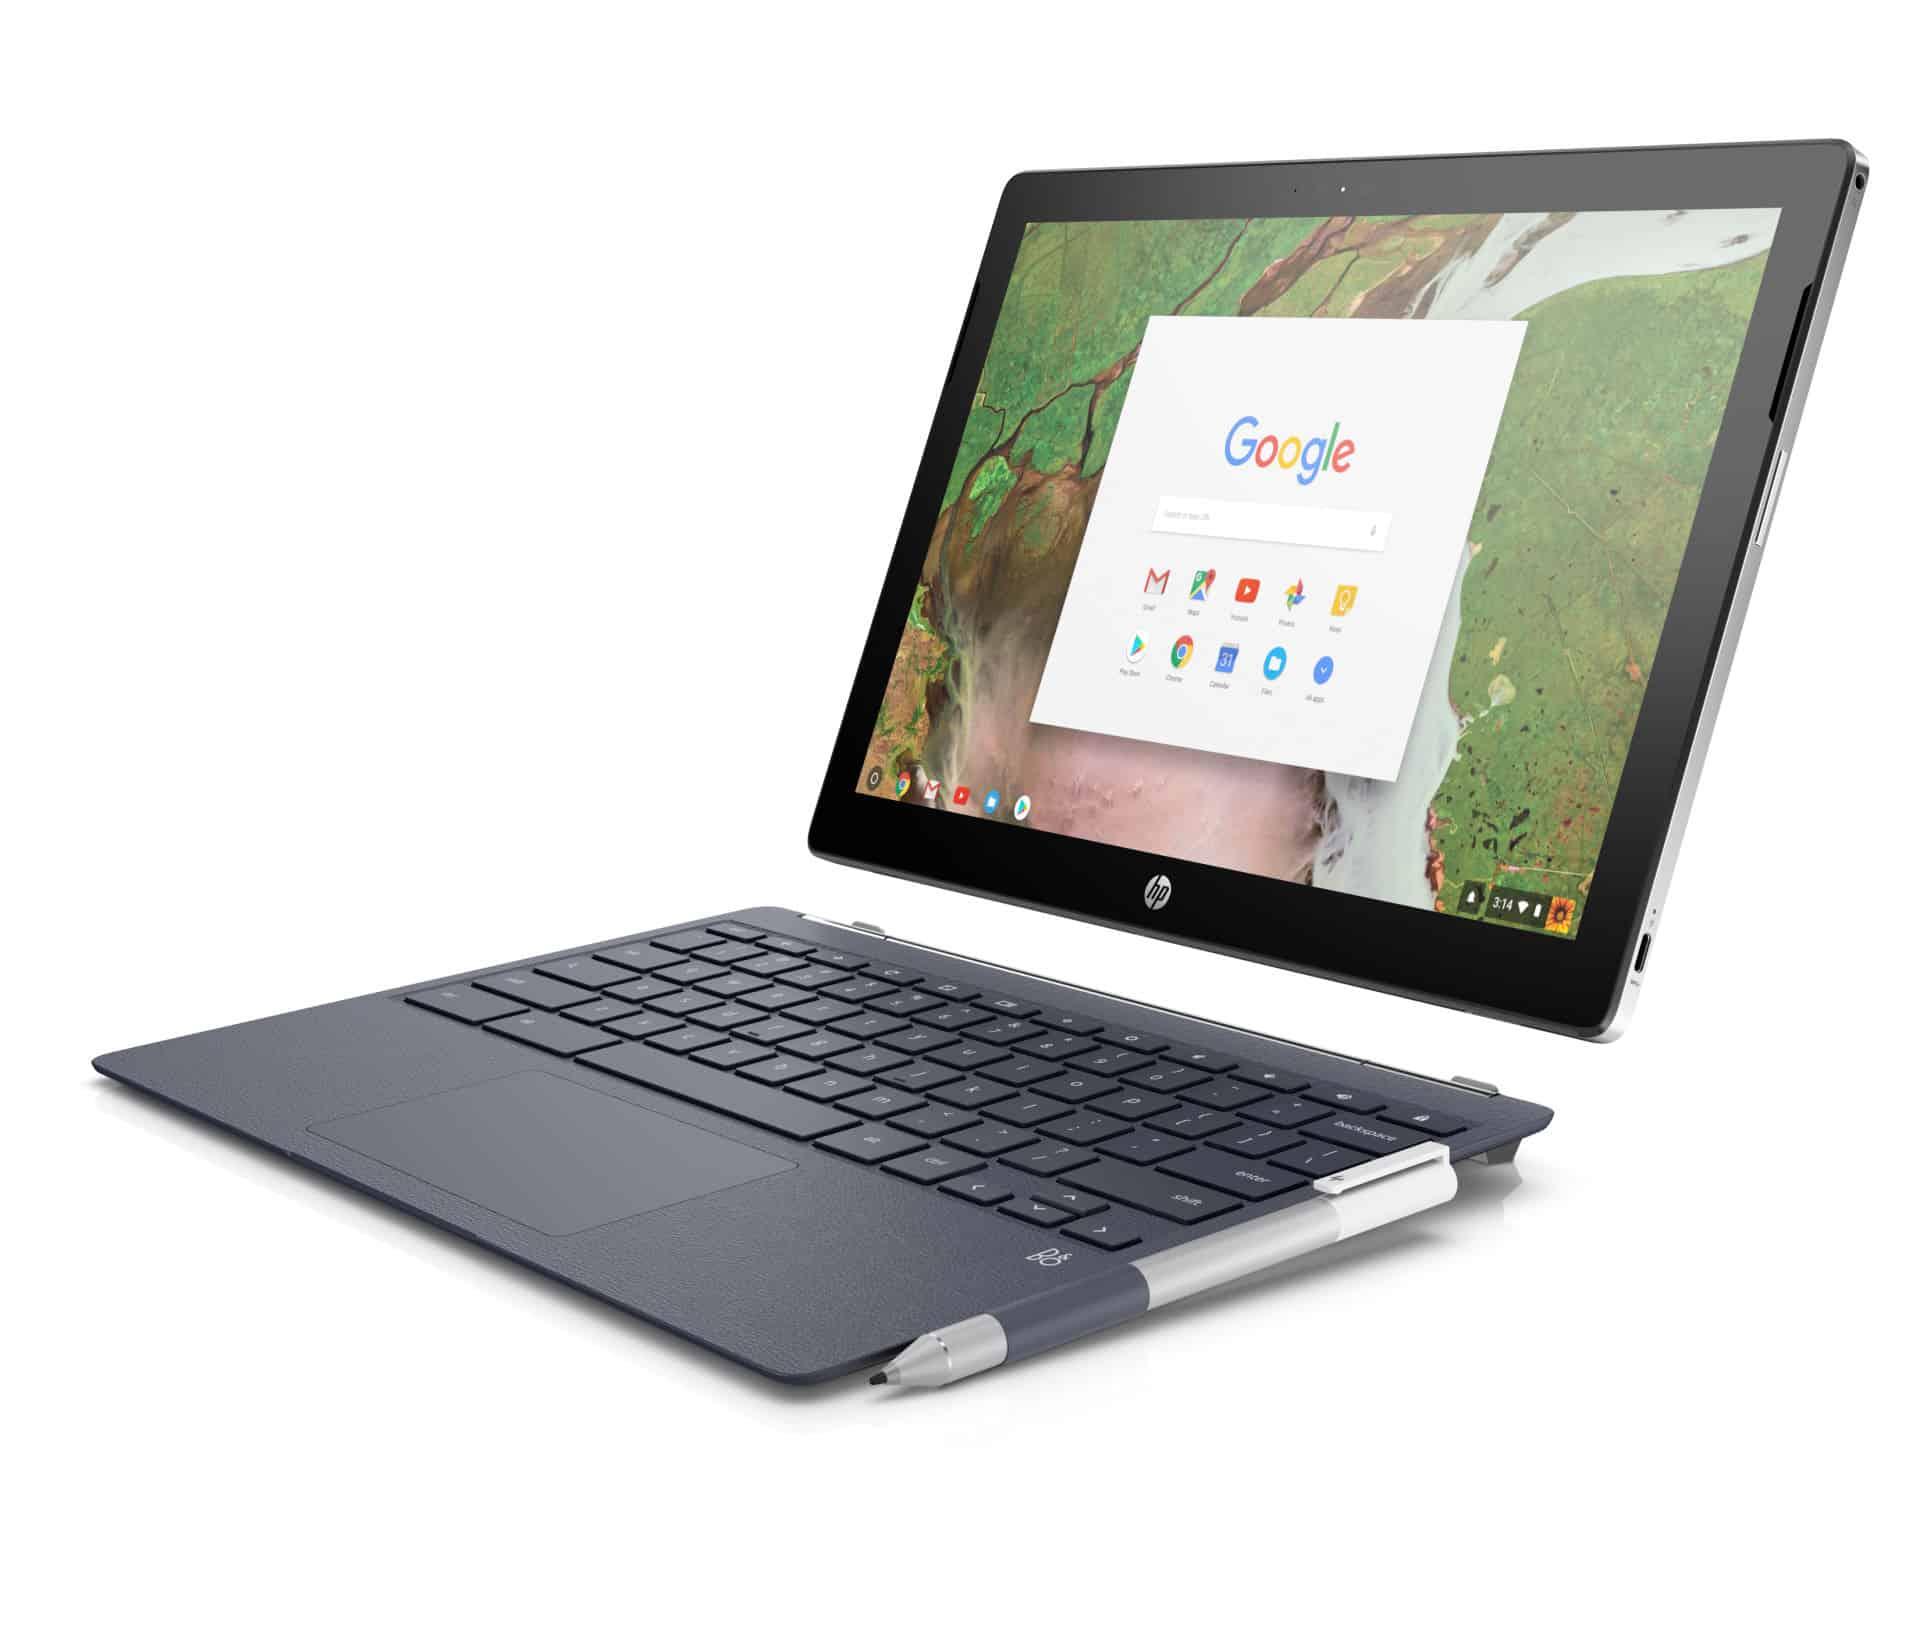 HP Chromebook x2 7